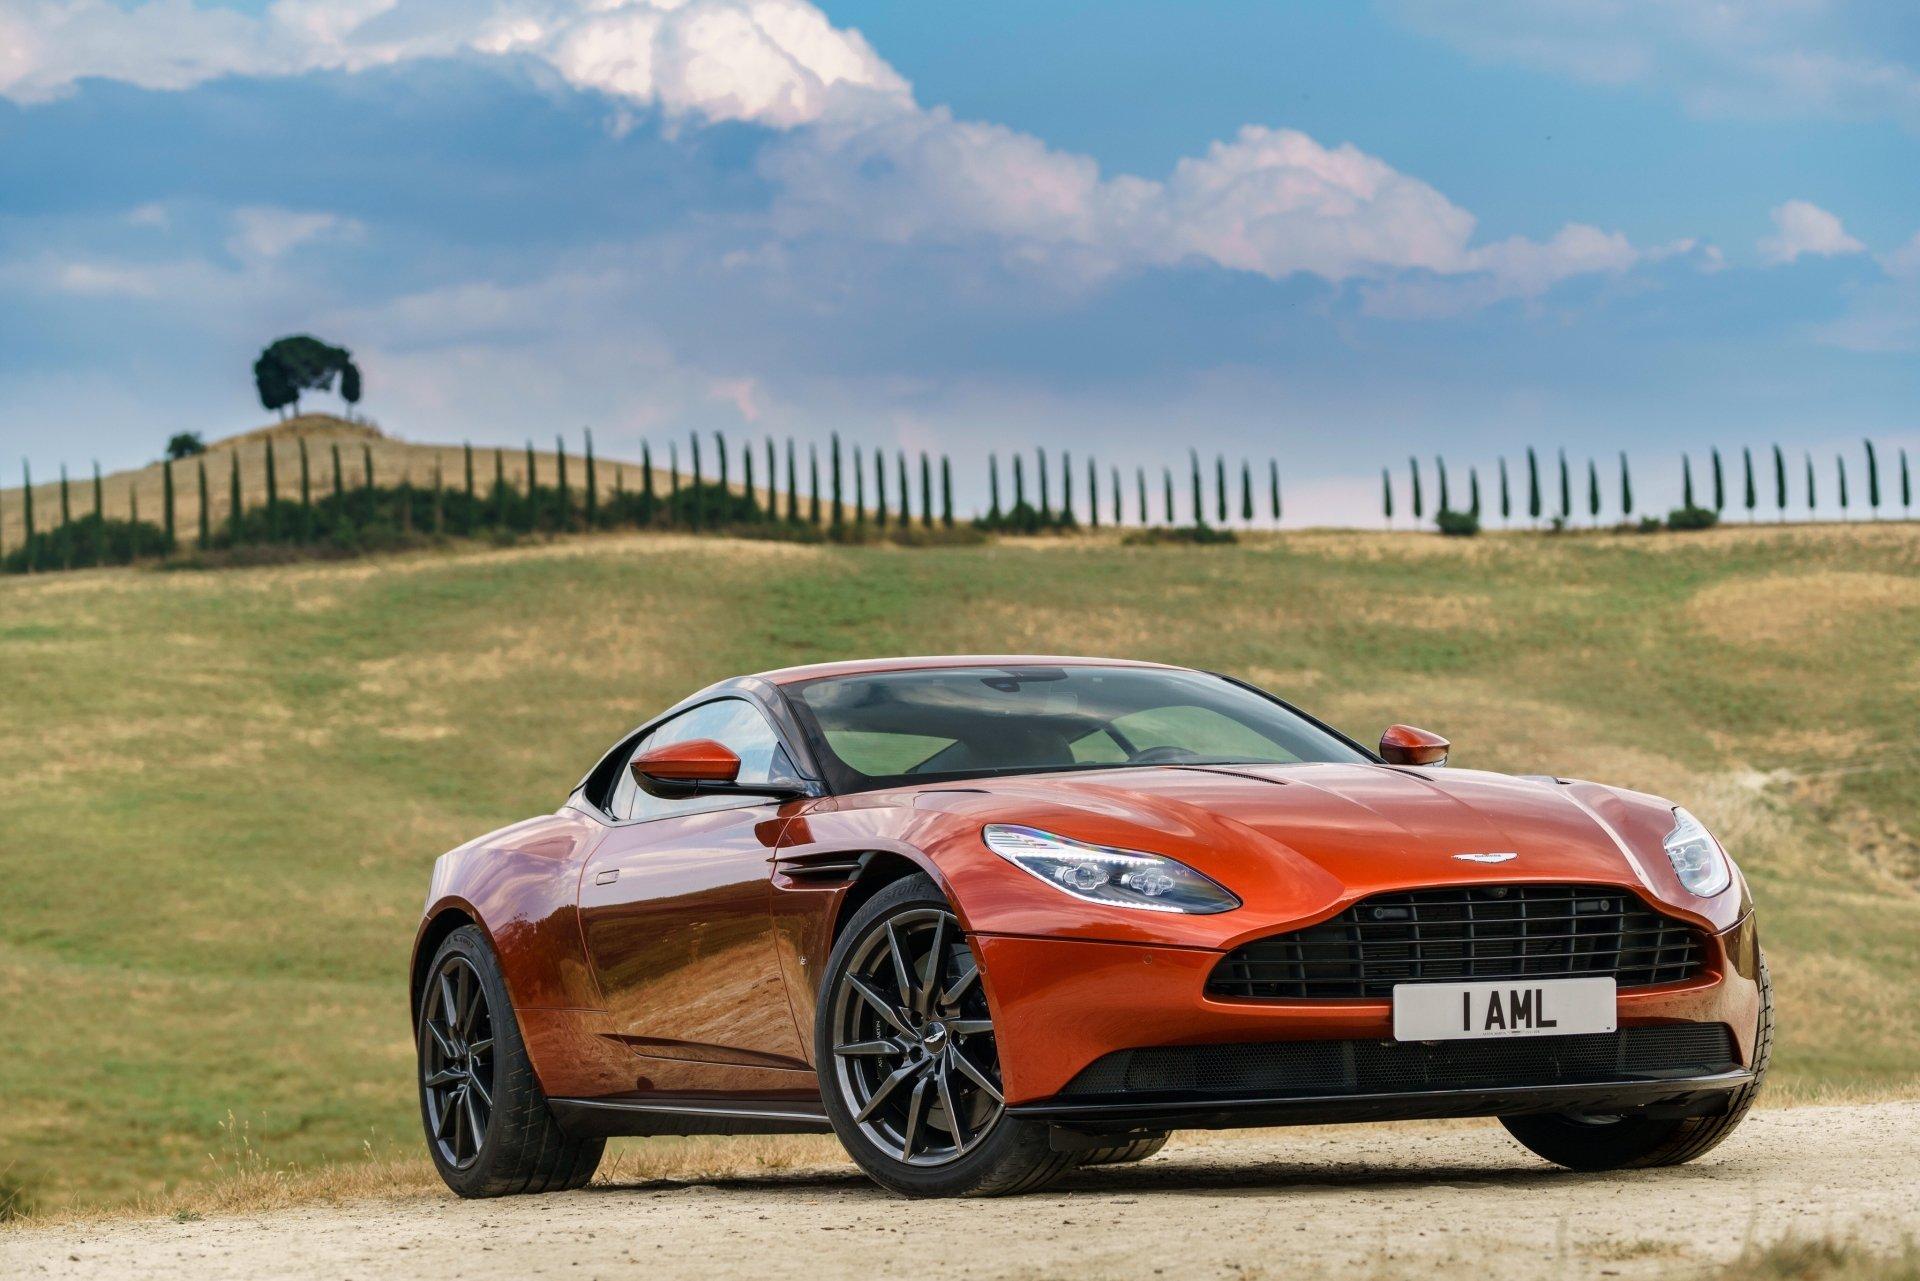 Vehicles - Aston Martin DB11  Aston Martin Car Vehicle Grand Tourer Orange Car Wallpaper